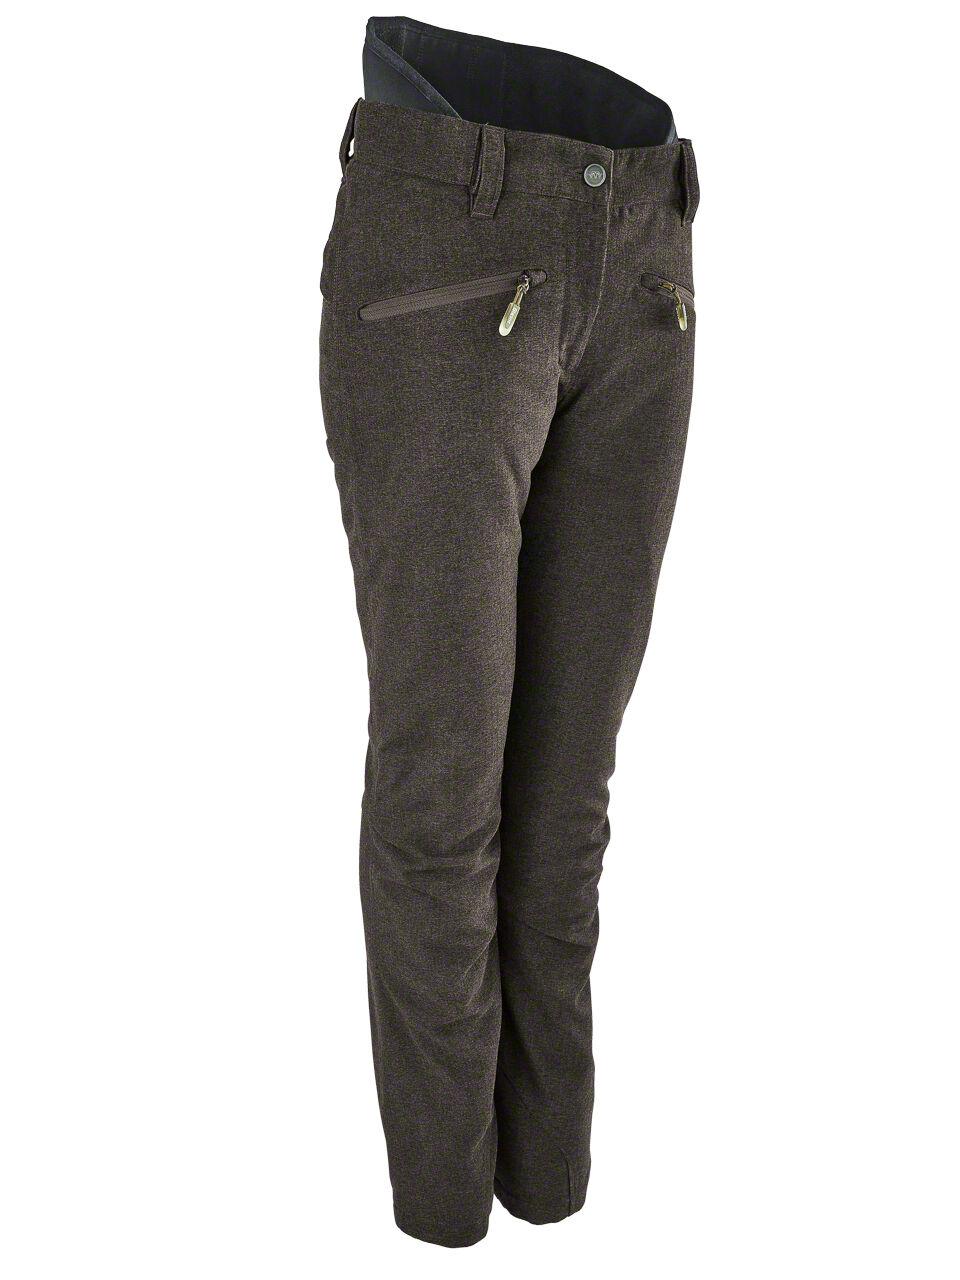 Blaser Ladies Hunting Trousers Winter - Vintage Primaloft  Paula - 116087-027  brand